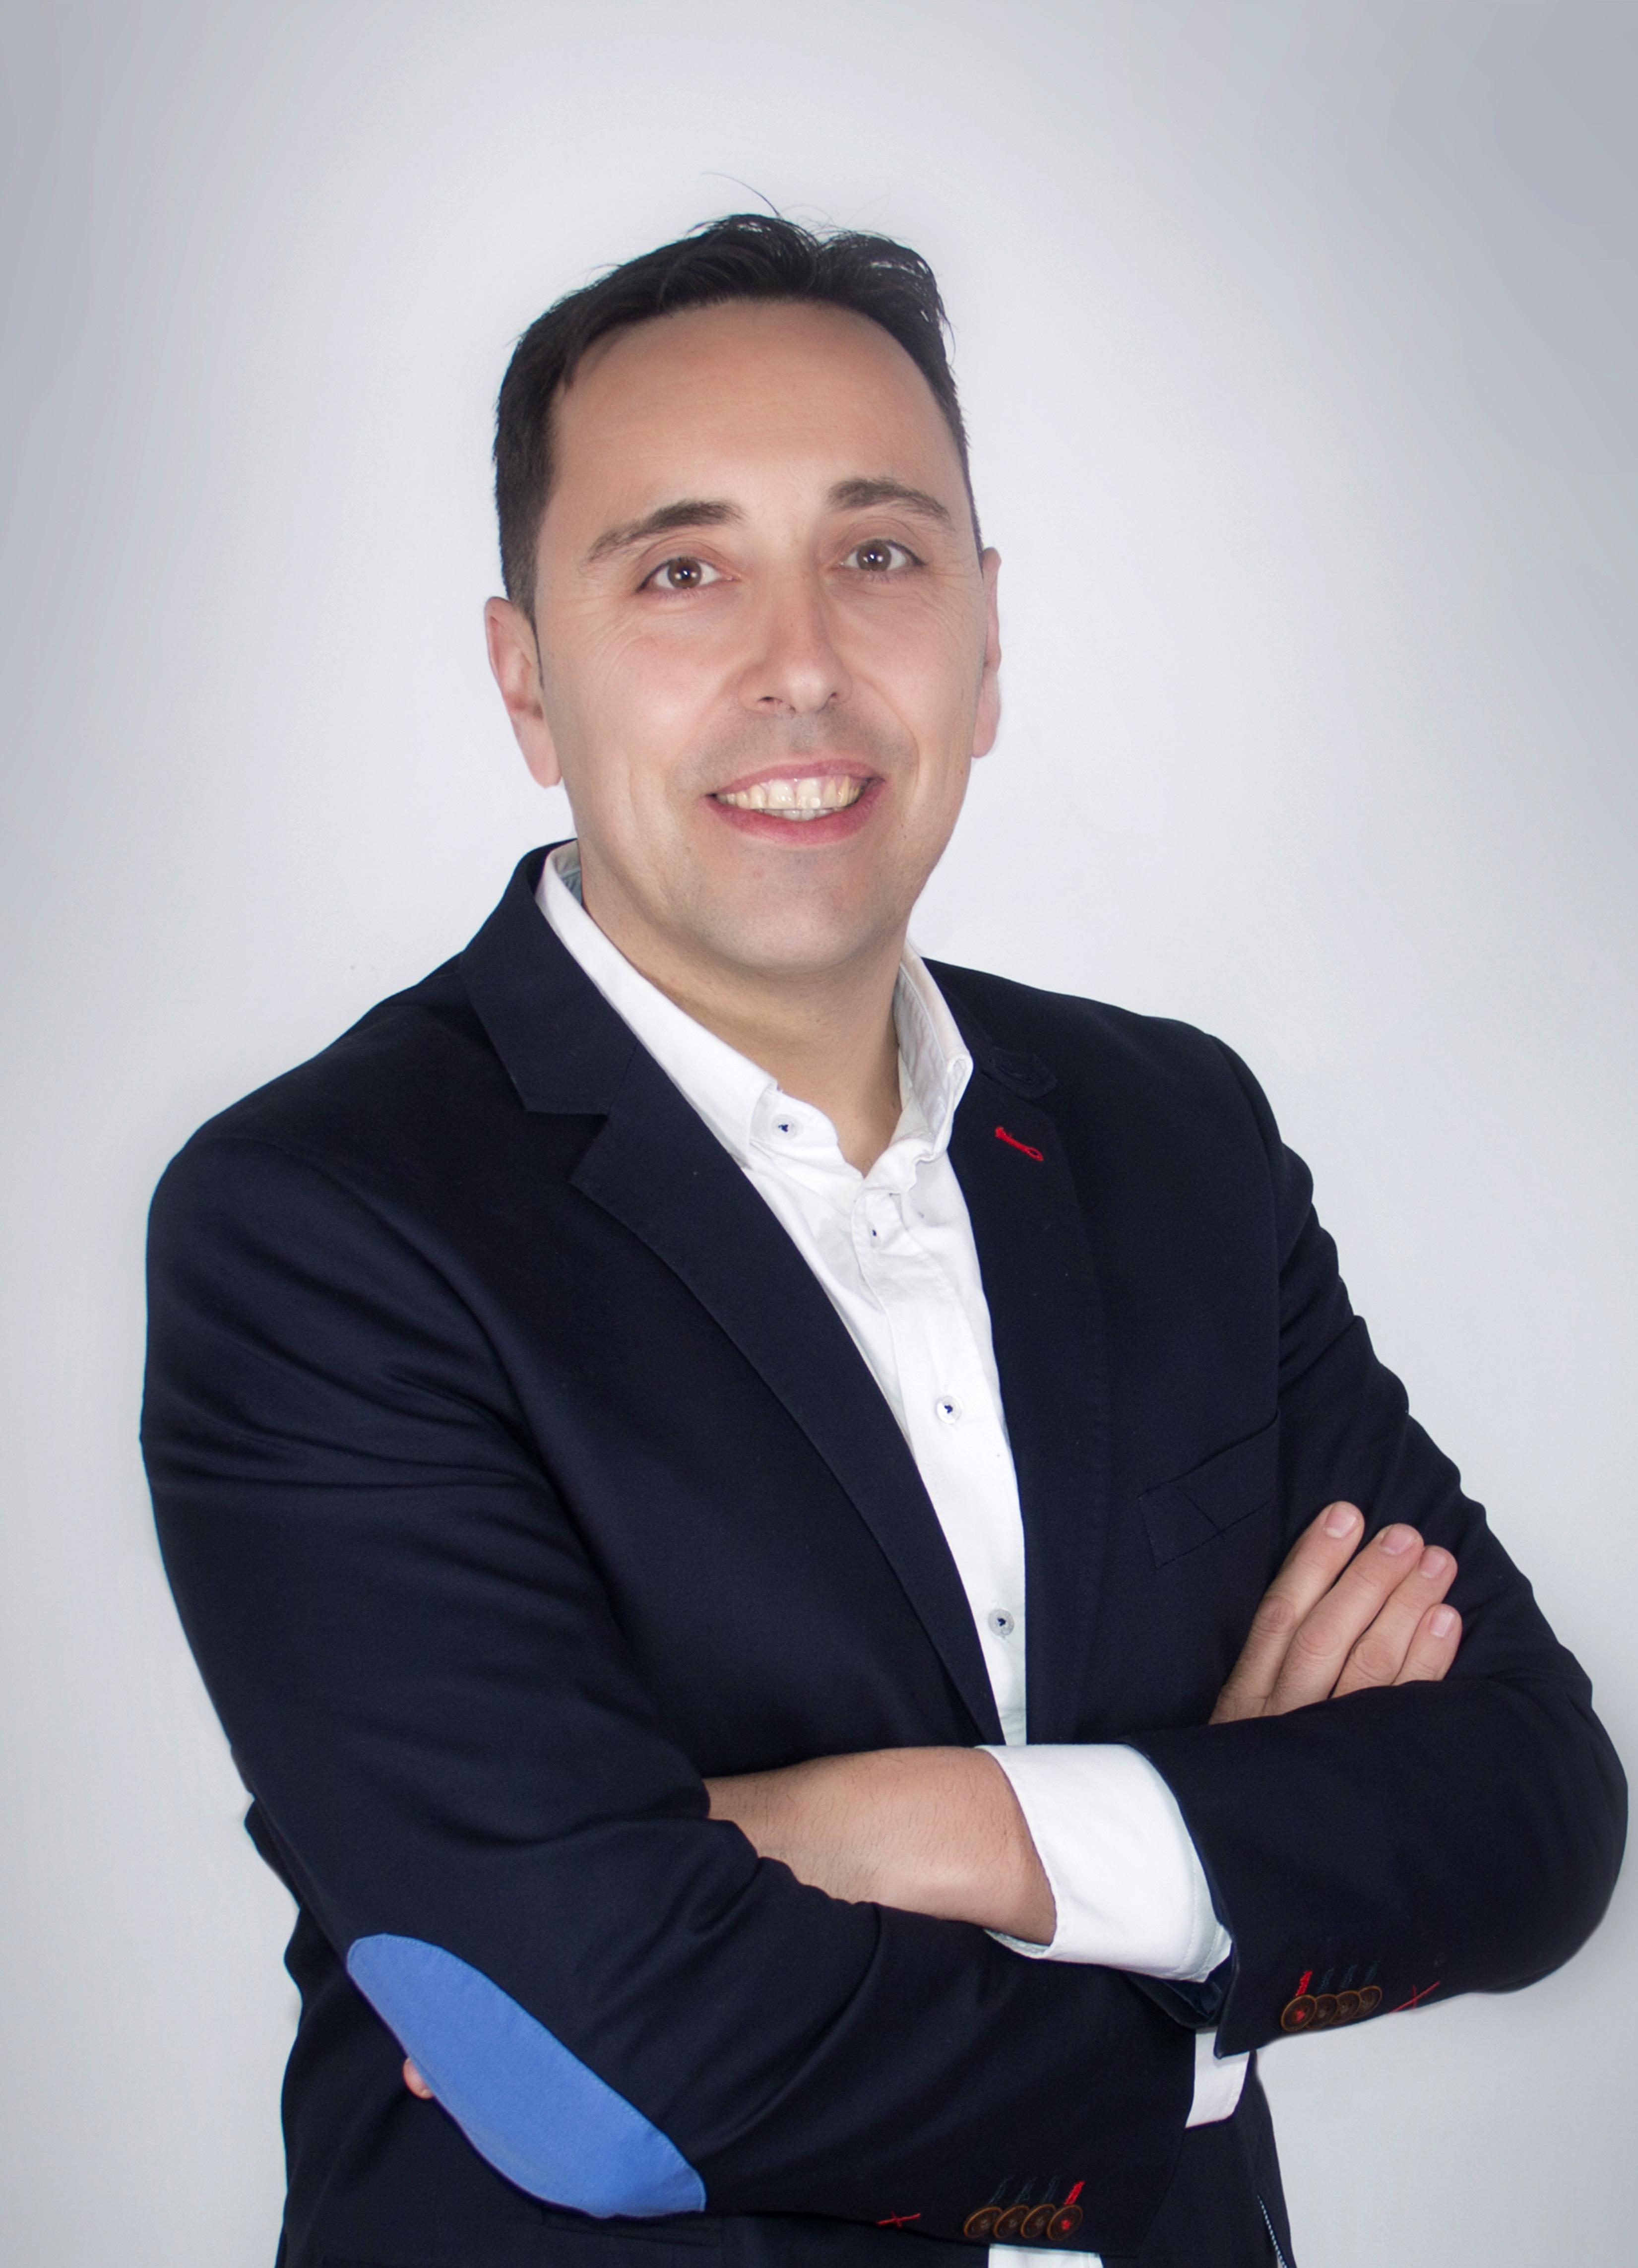 Juan José Clemente